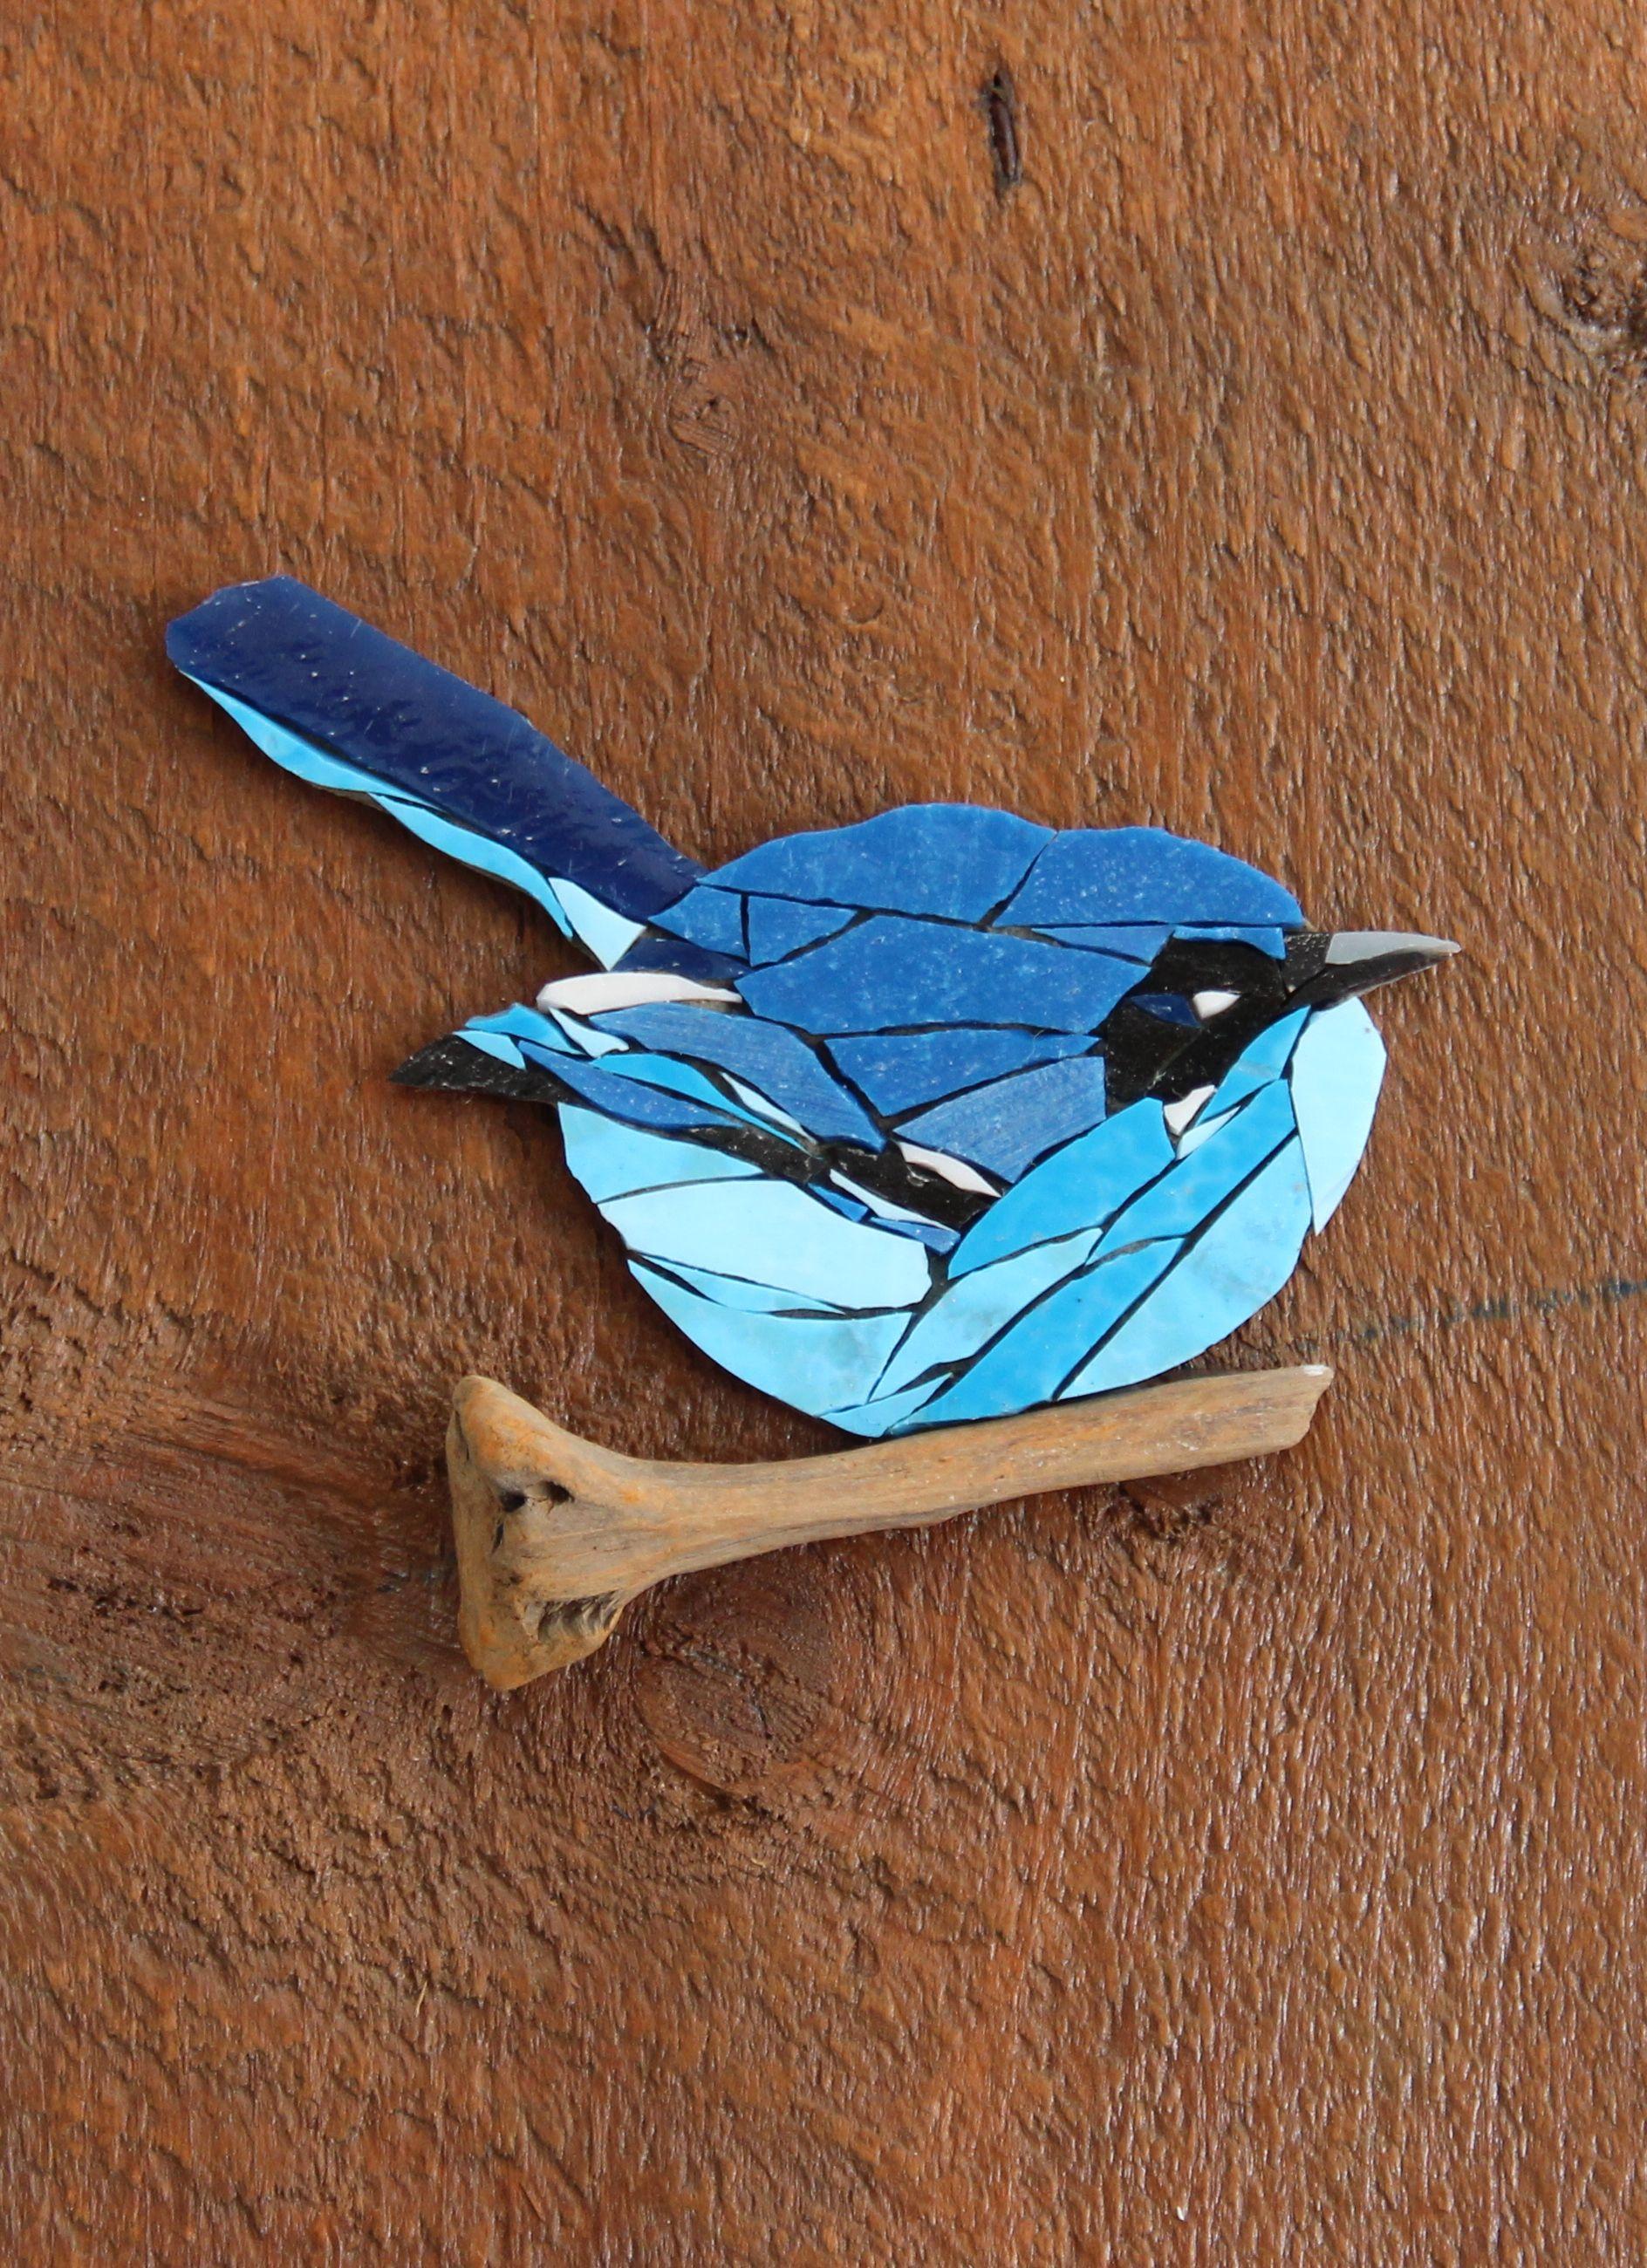 Pablo Key Storage Decoration Storage Key Holders Mosaic Painting Bird Mosaic Wood Mosaic Birds Mosaic Animals Mosaic Artwork